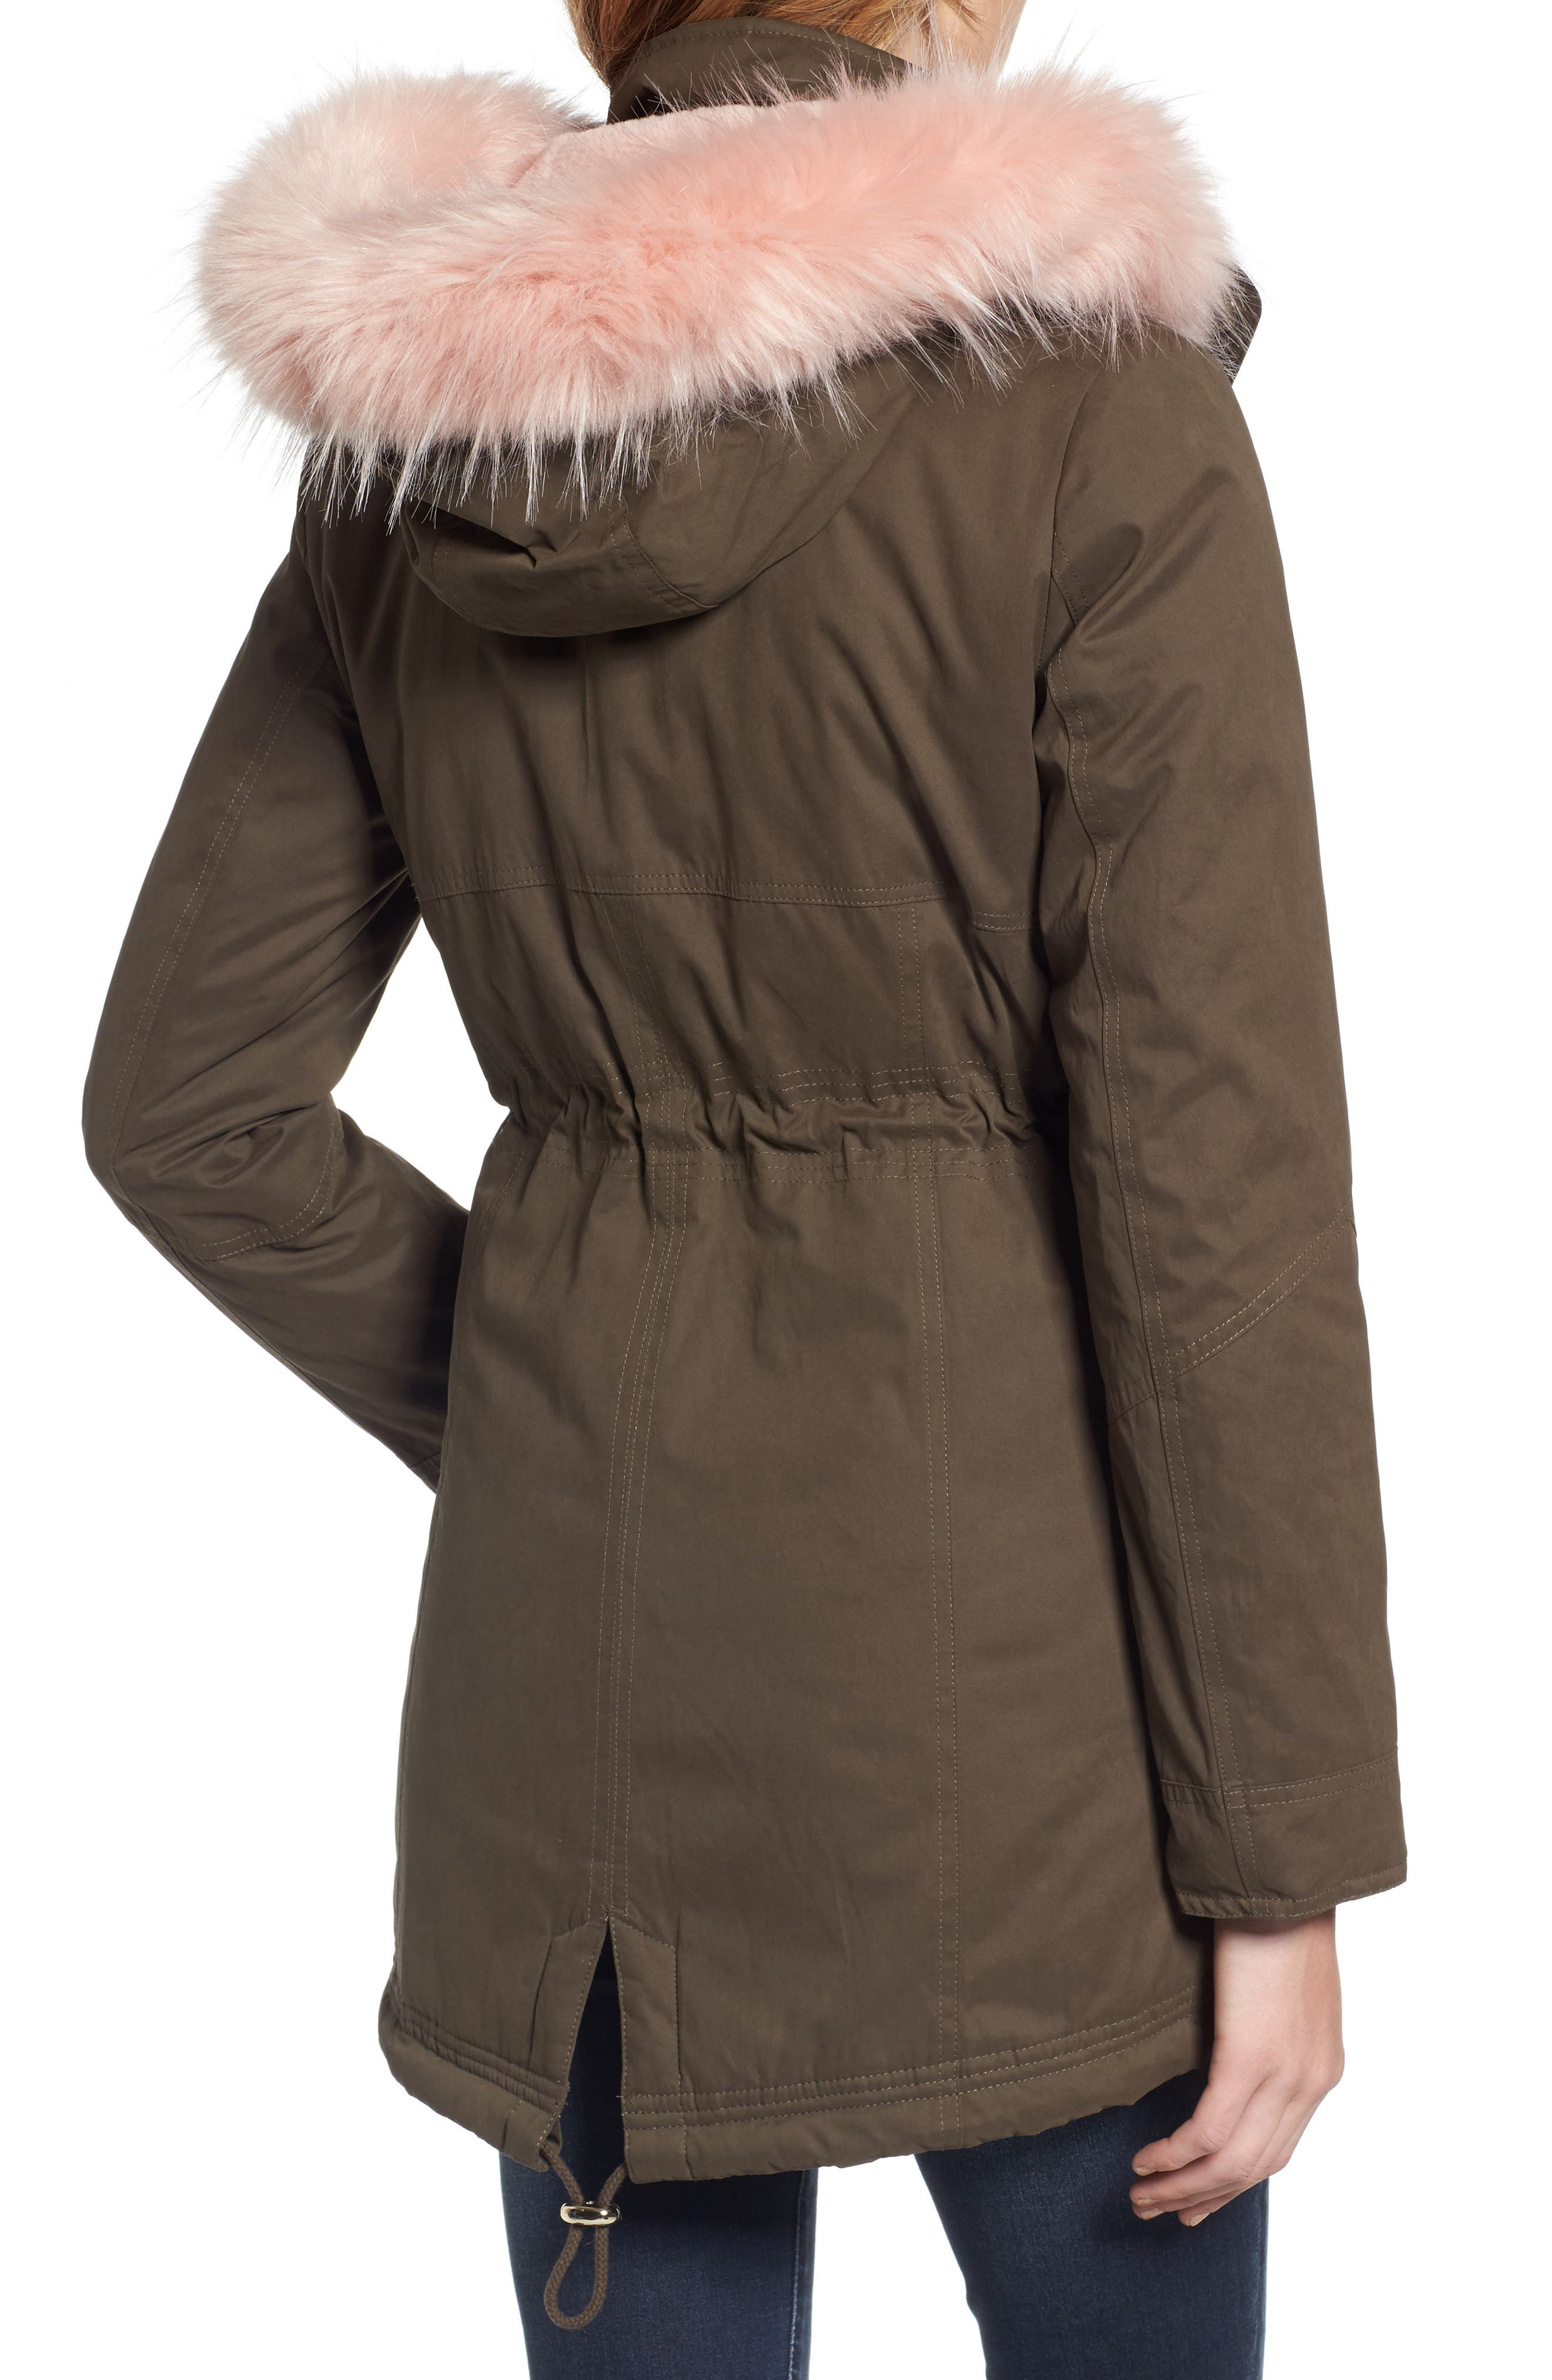 Parka with Removable Faux Fur Trim Hood,                             Alternate thumbnail 2, color,                             Olive/ Pink Fur